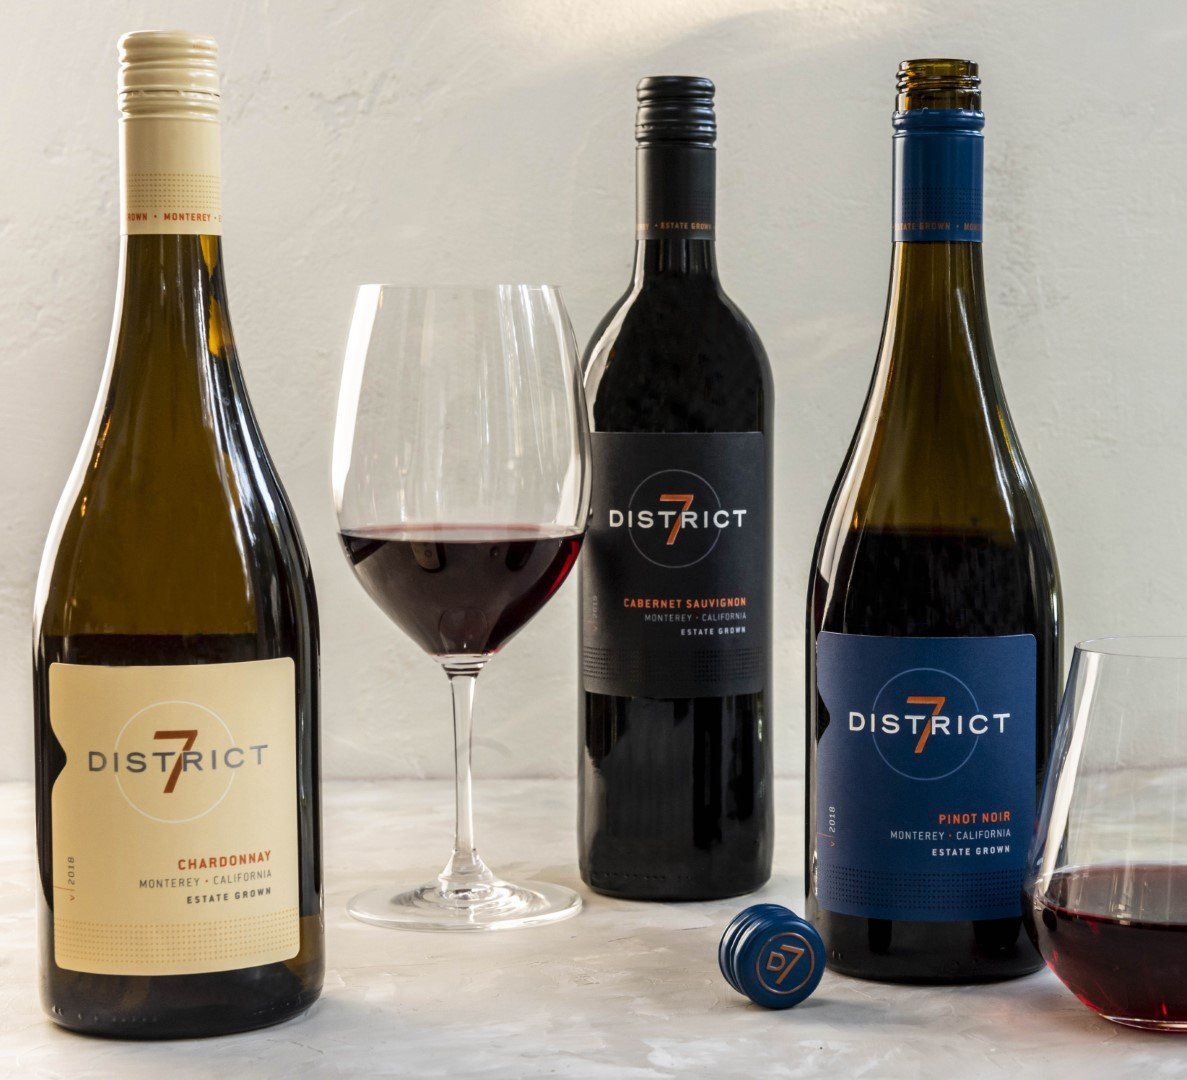 2018 District 7 Chardonnay Monterey